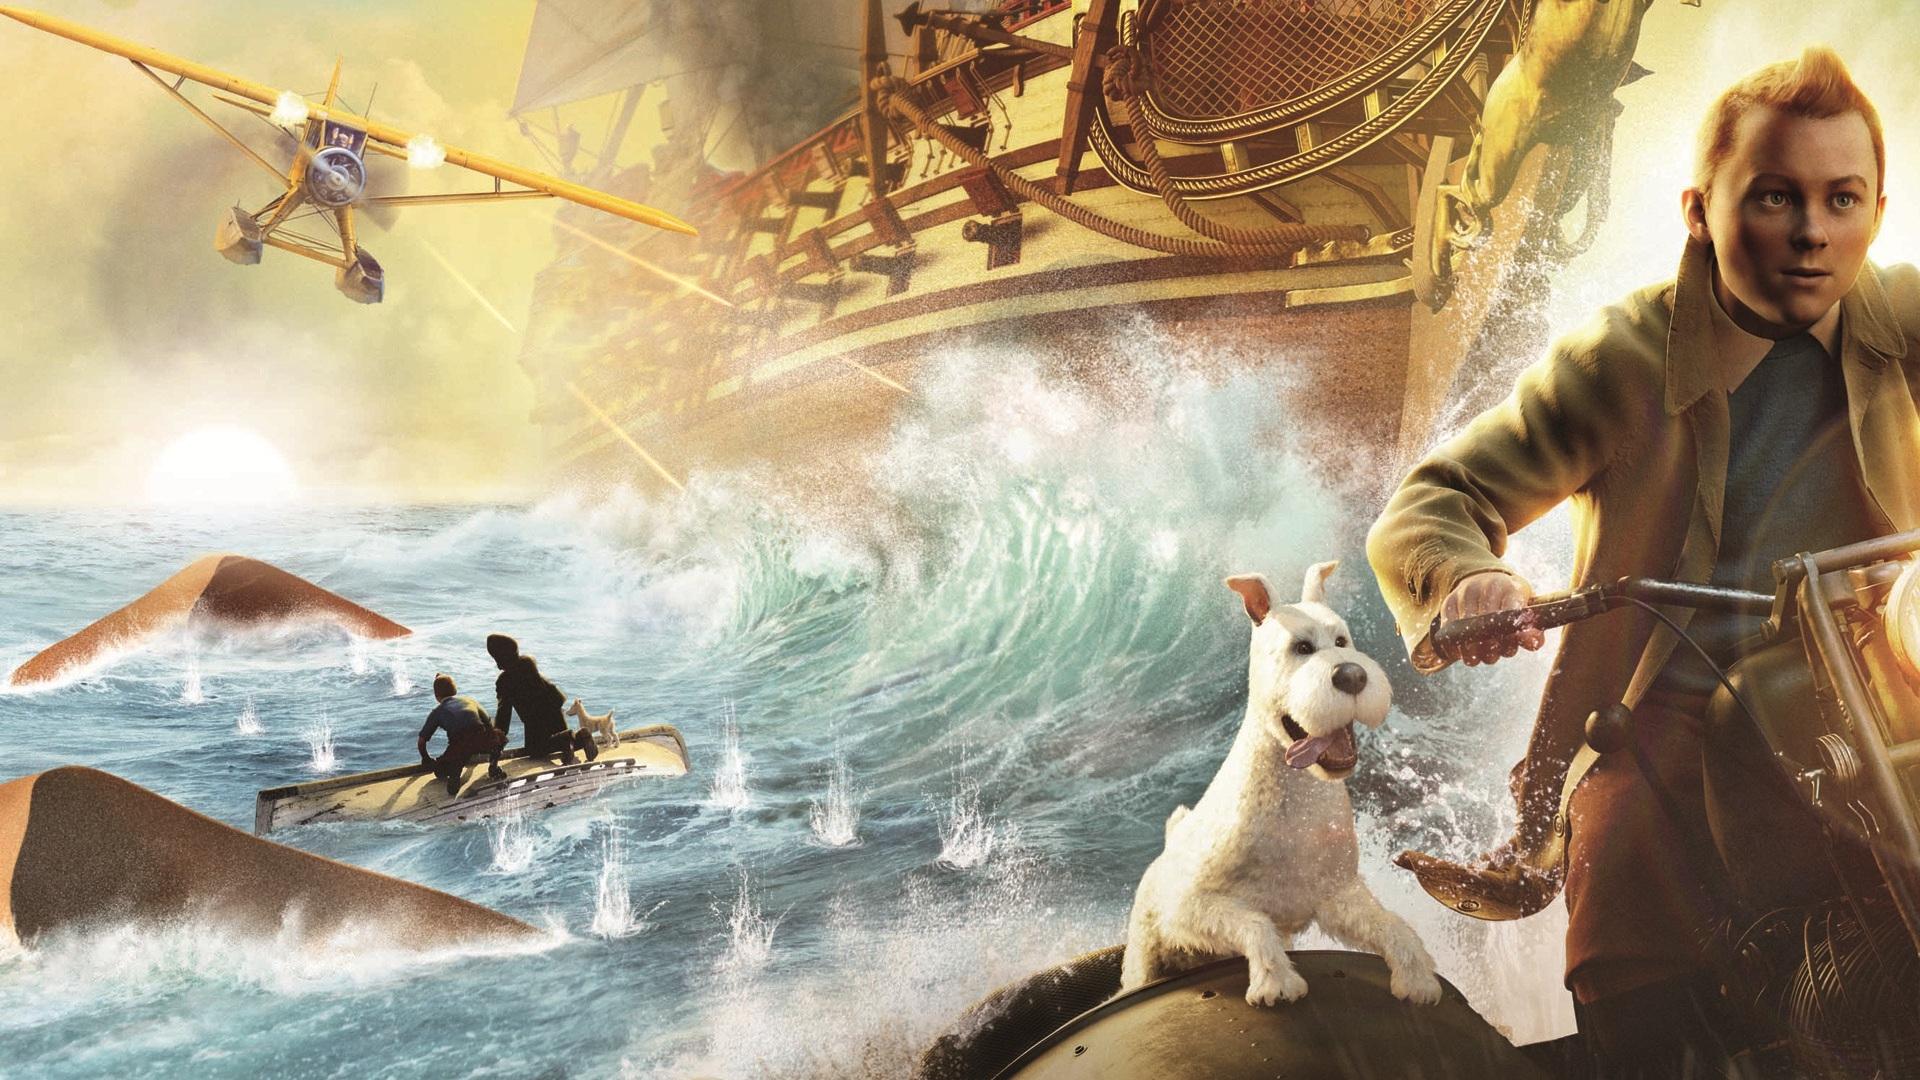 The Adventurers Film